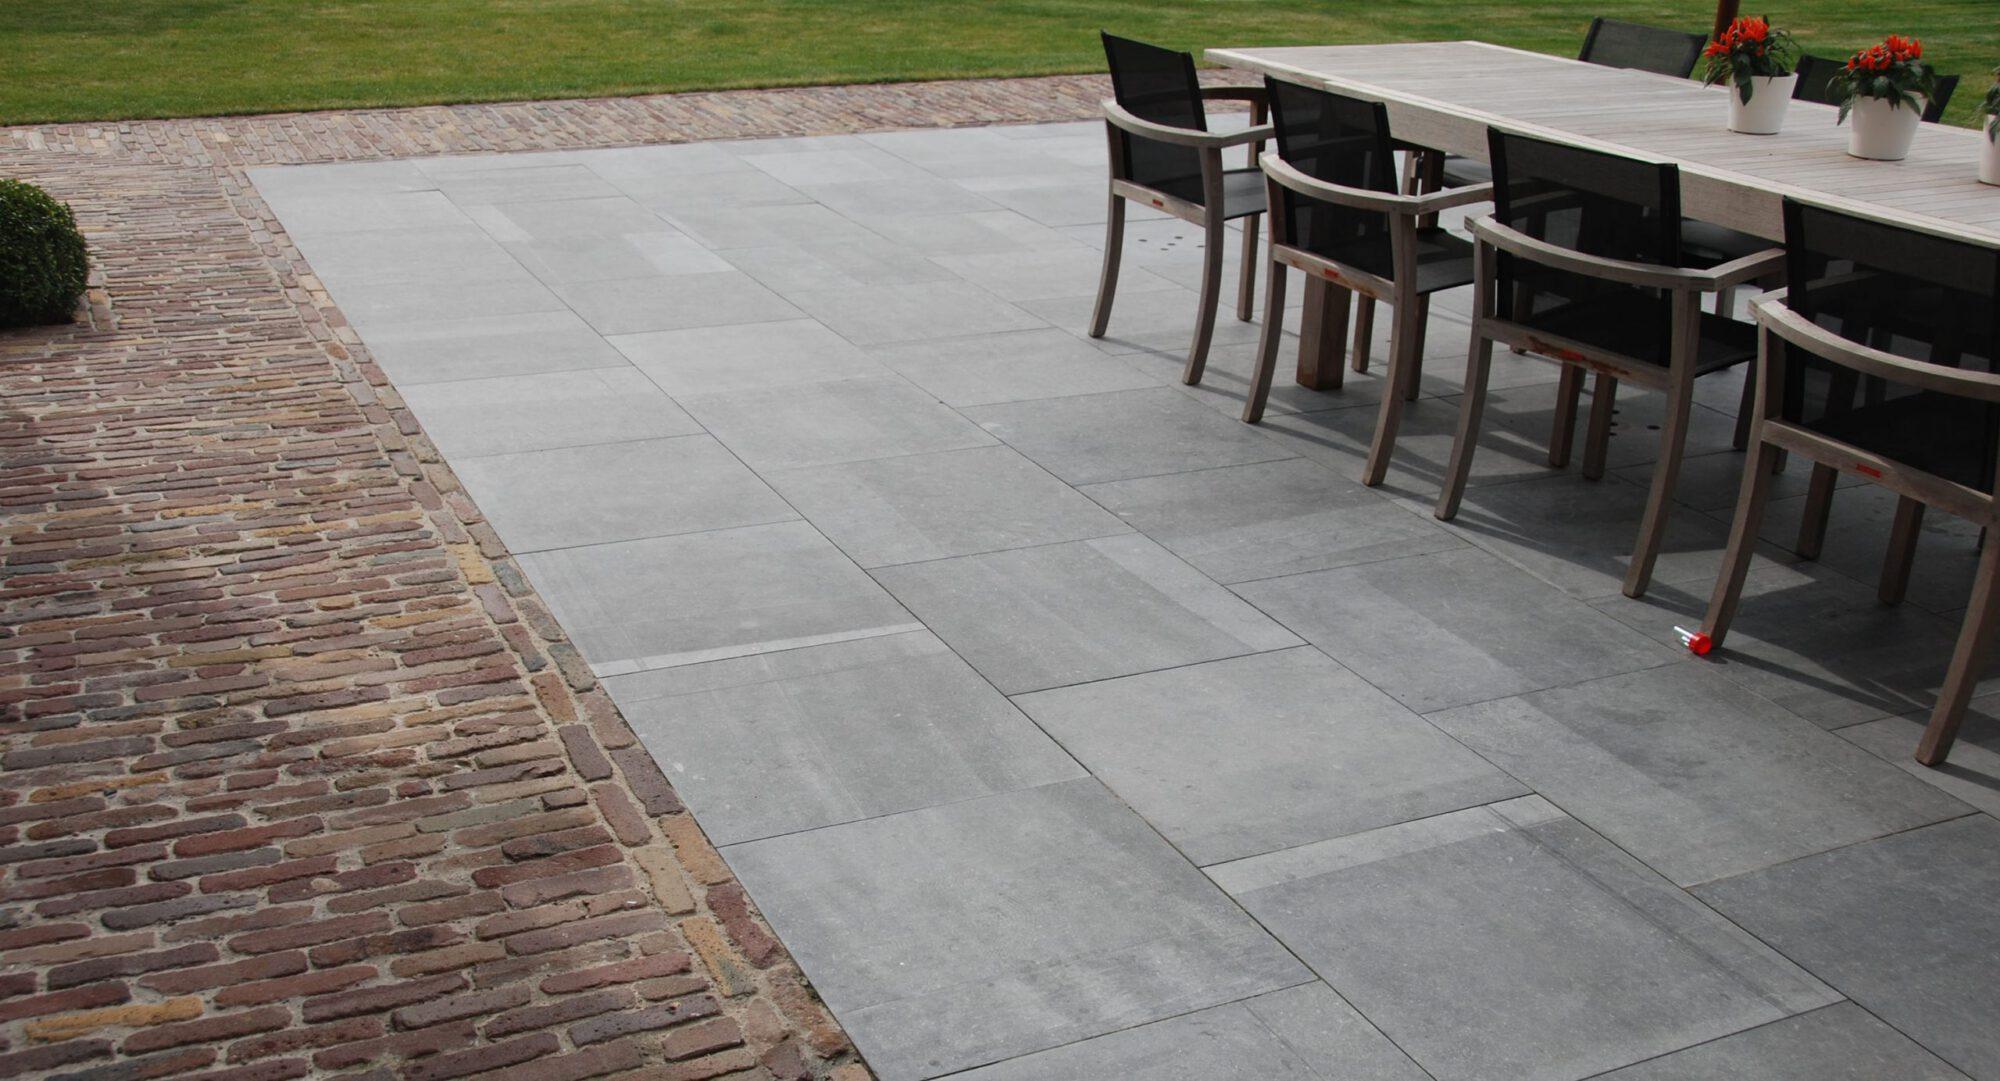 Belgian Blue stone - Floor tiles - Natural stone - Tiles Sawn